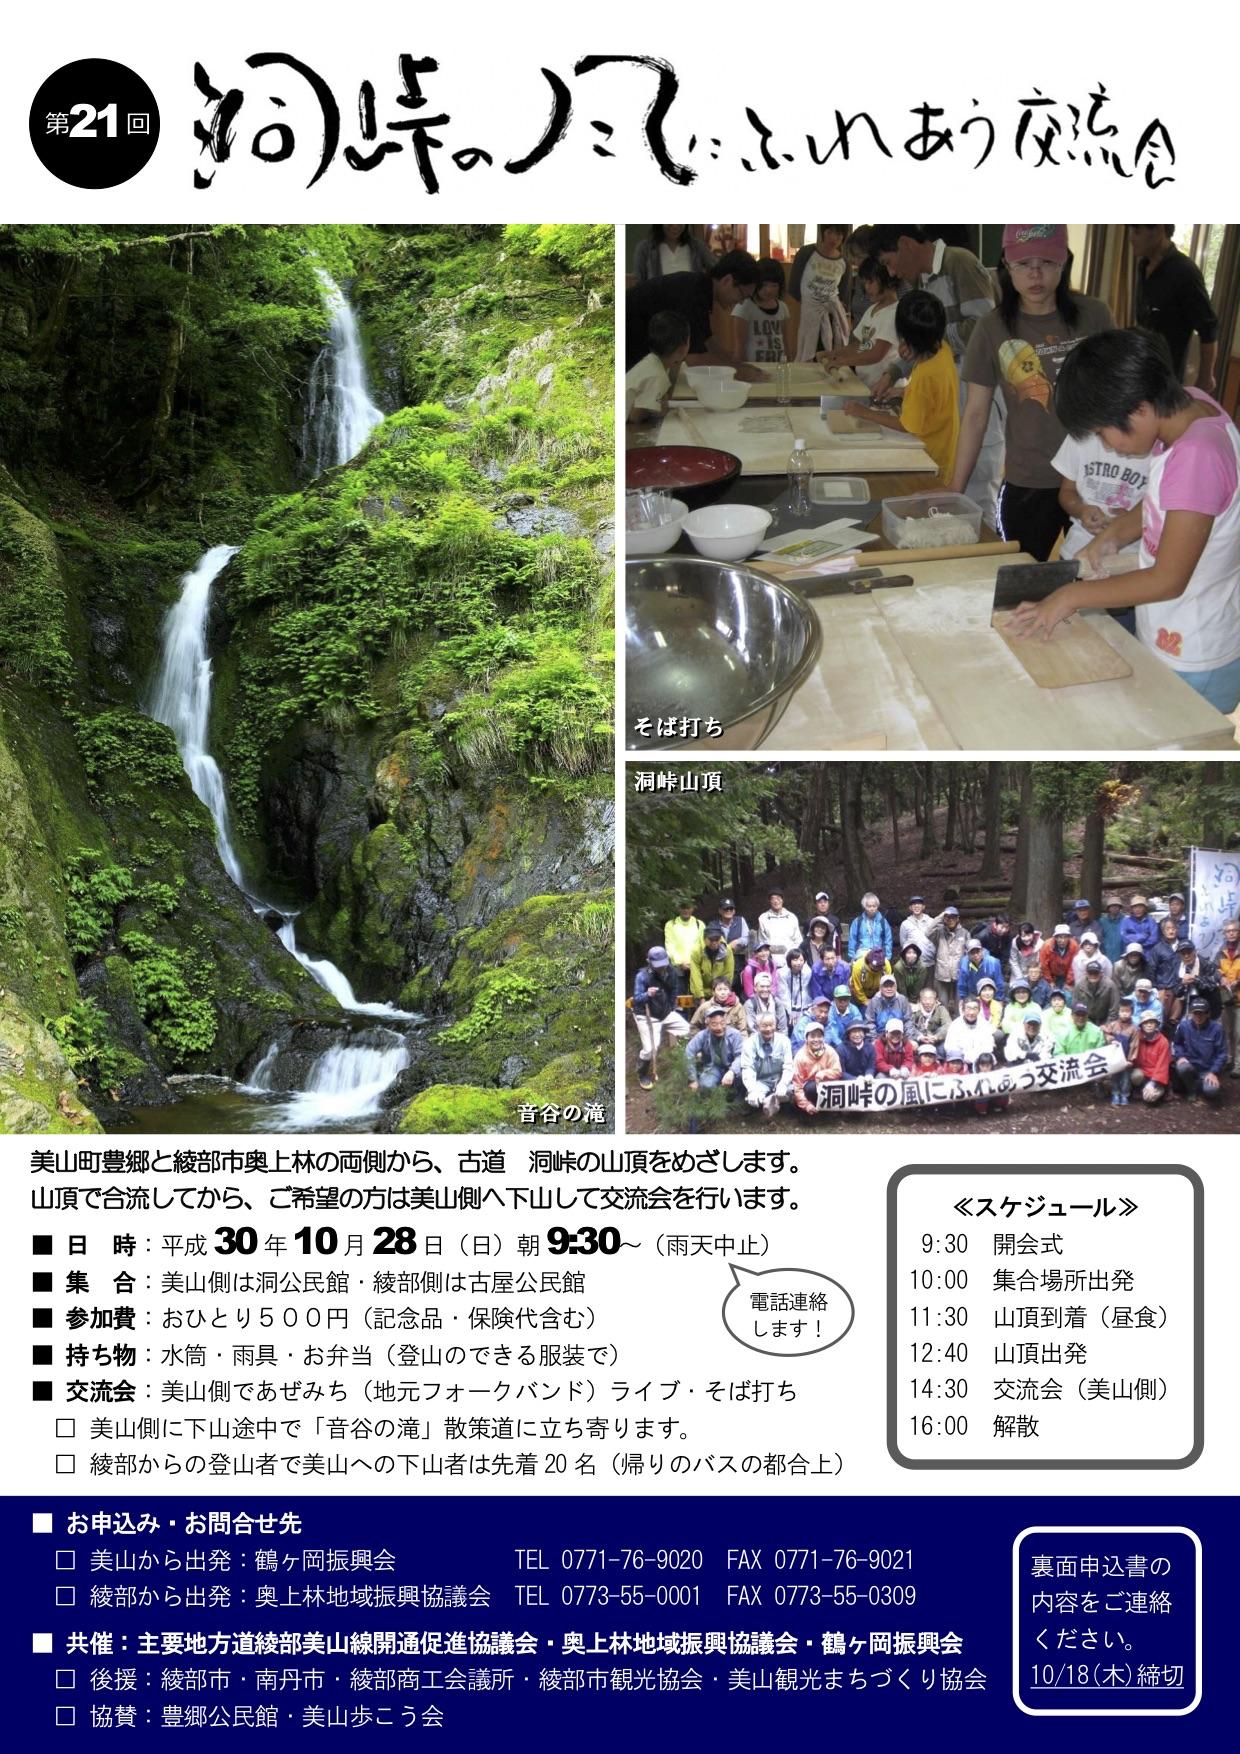 181028 tsurugaoka